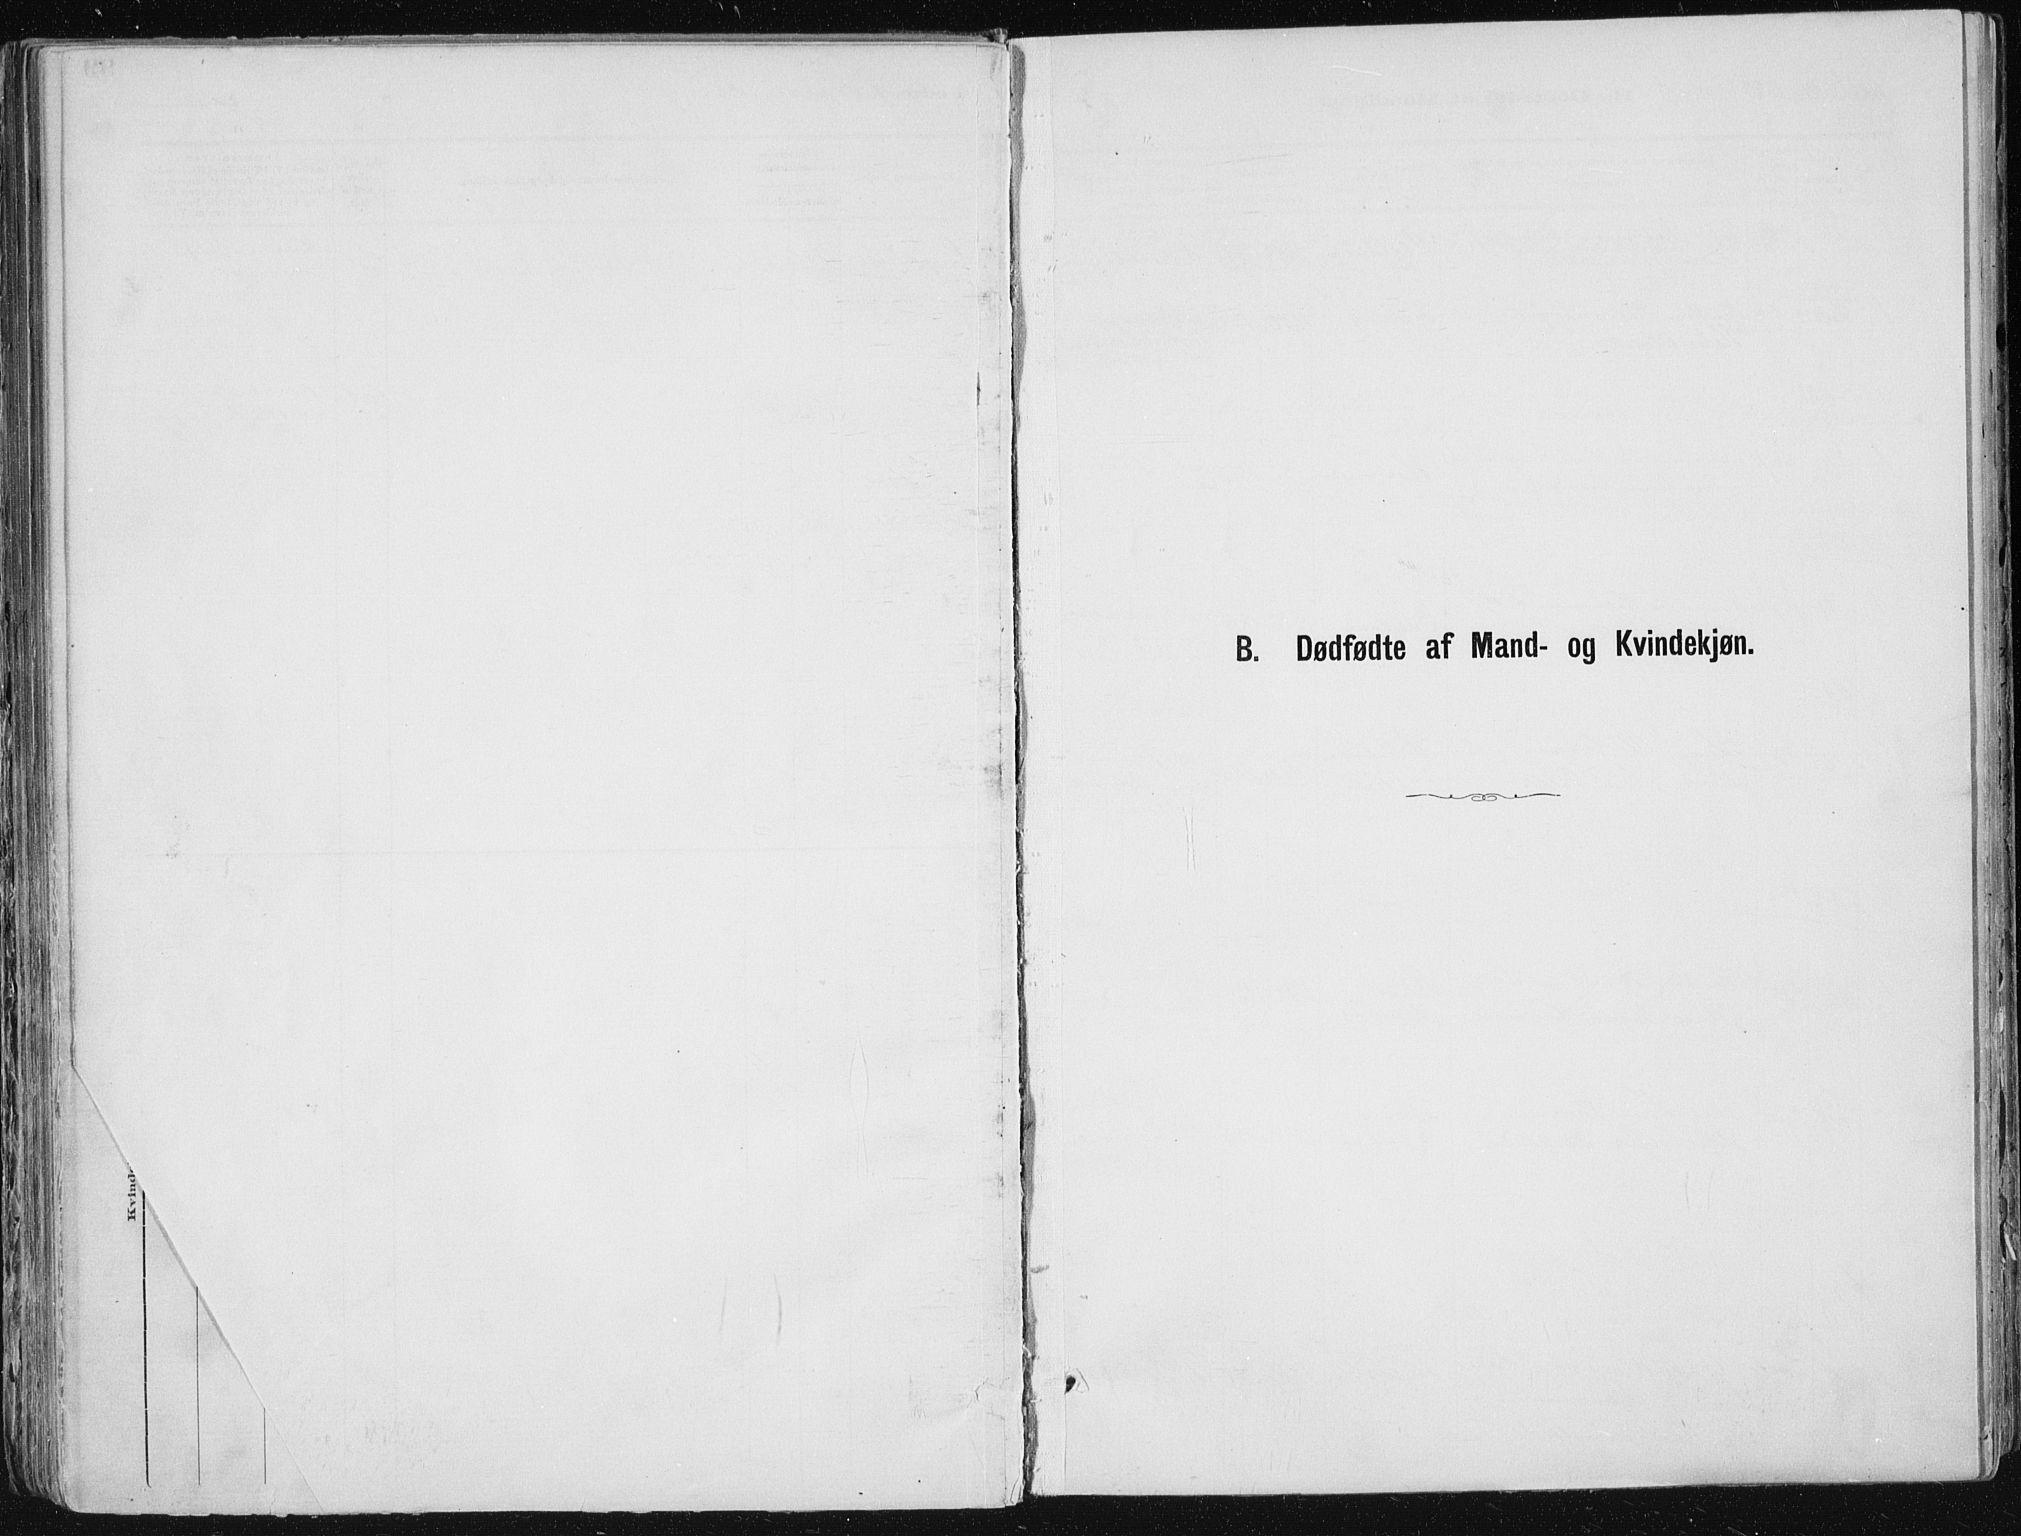 SAKO, Tinn kirkebøker, F/Fa/L0007: Ministerialbok nr. I 7, 1878-1922